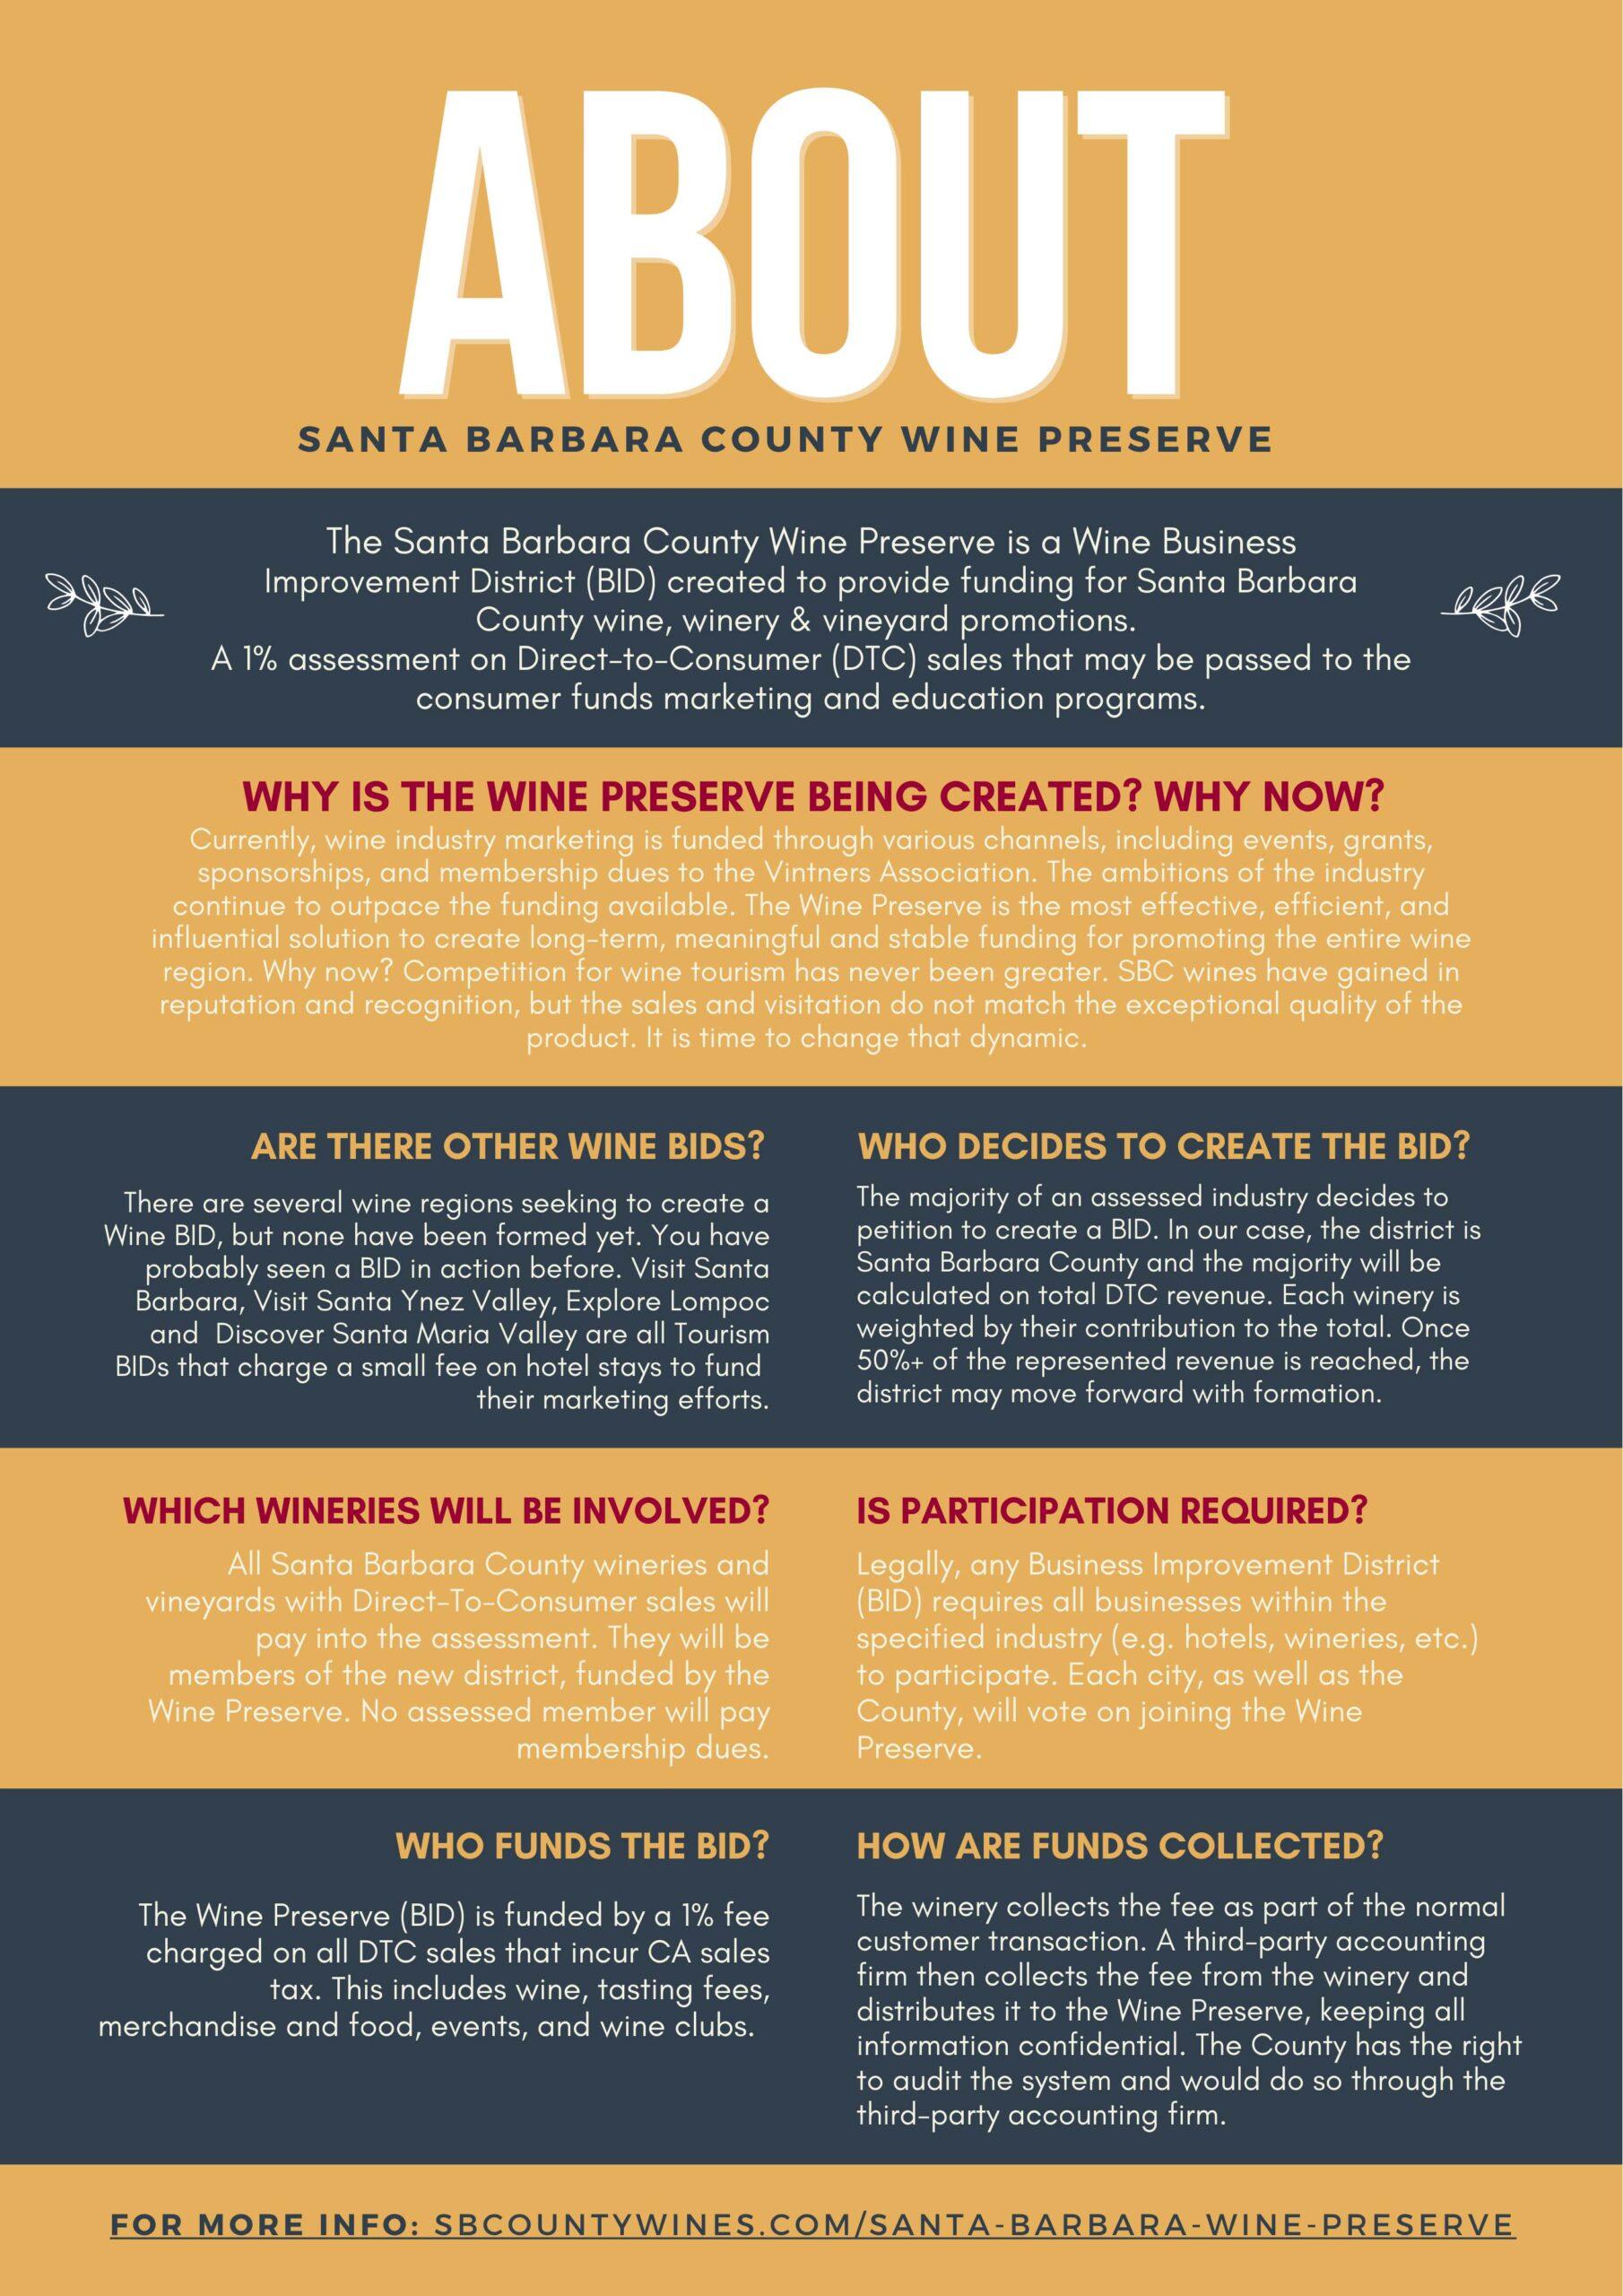 About Santa Barbara Wine Preserve